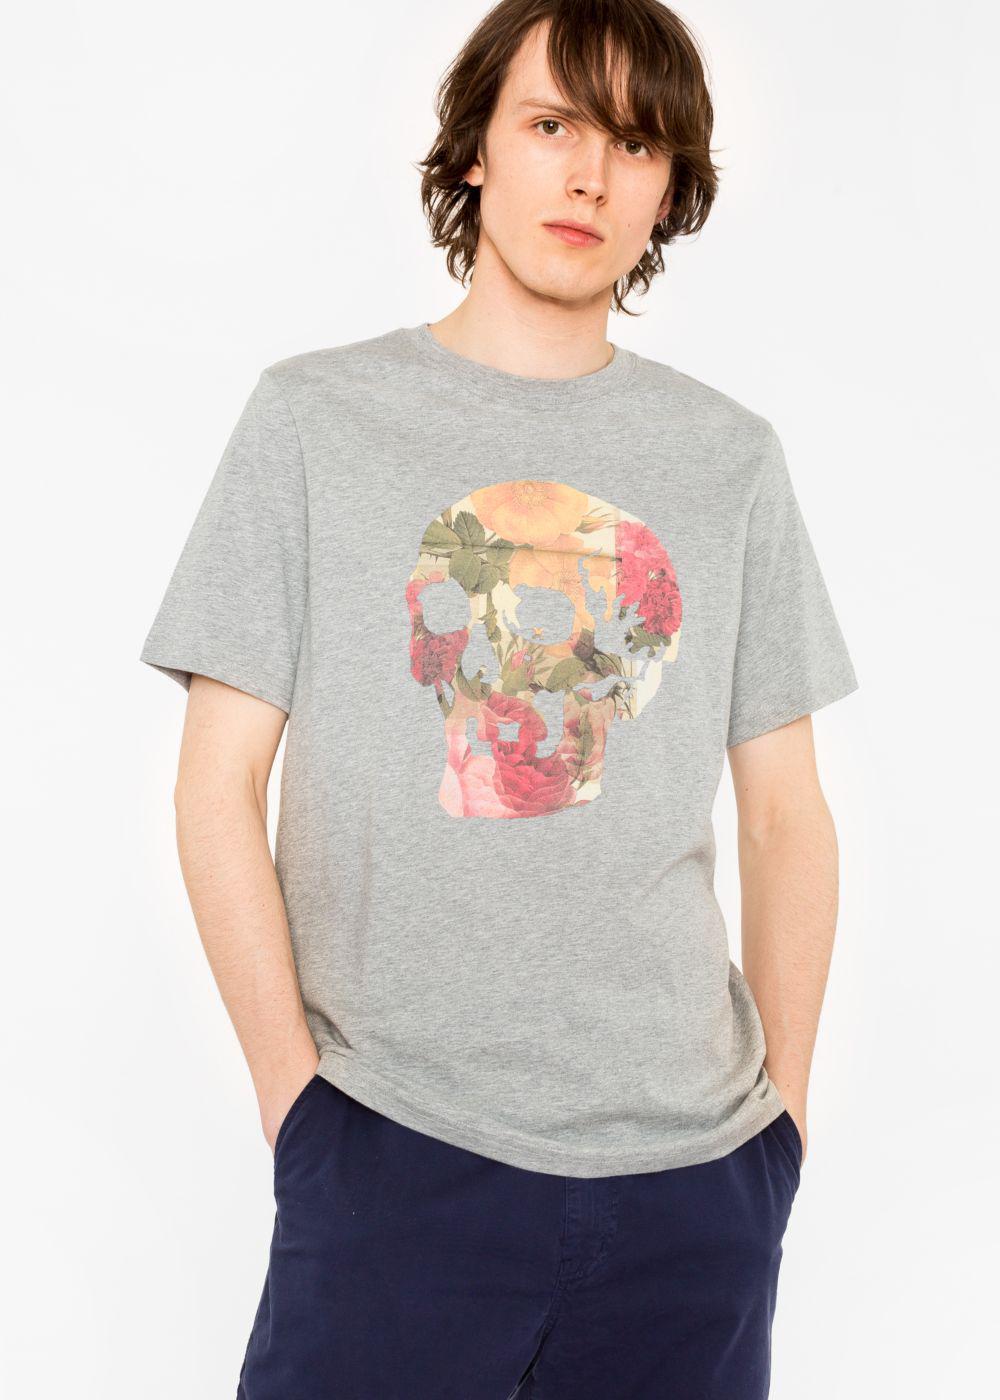 Paul smith men 39 s grey 39 floral skull 39 print organic cotton for Organic cotton t shirt printing